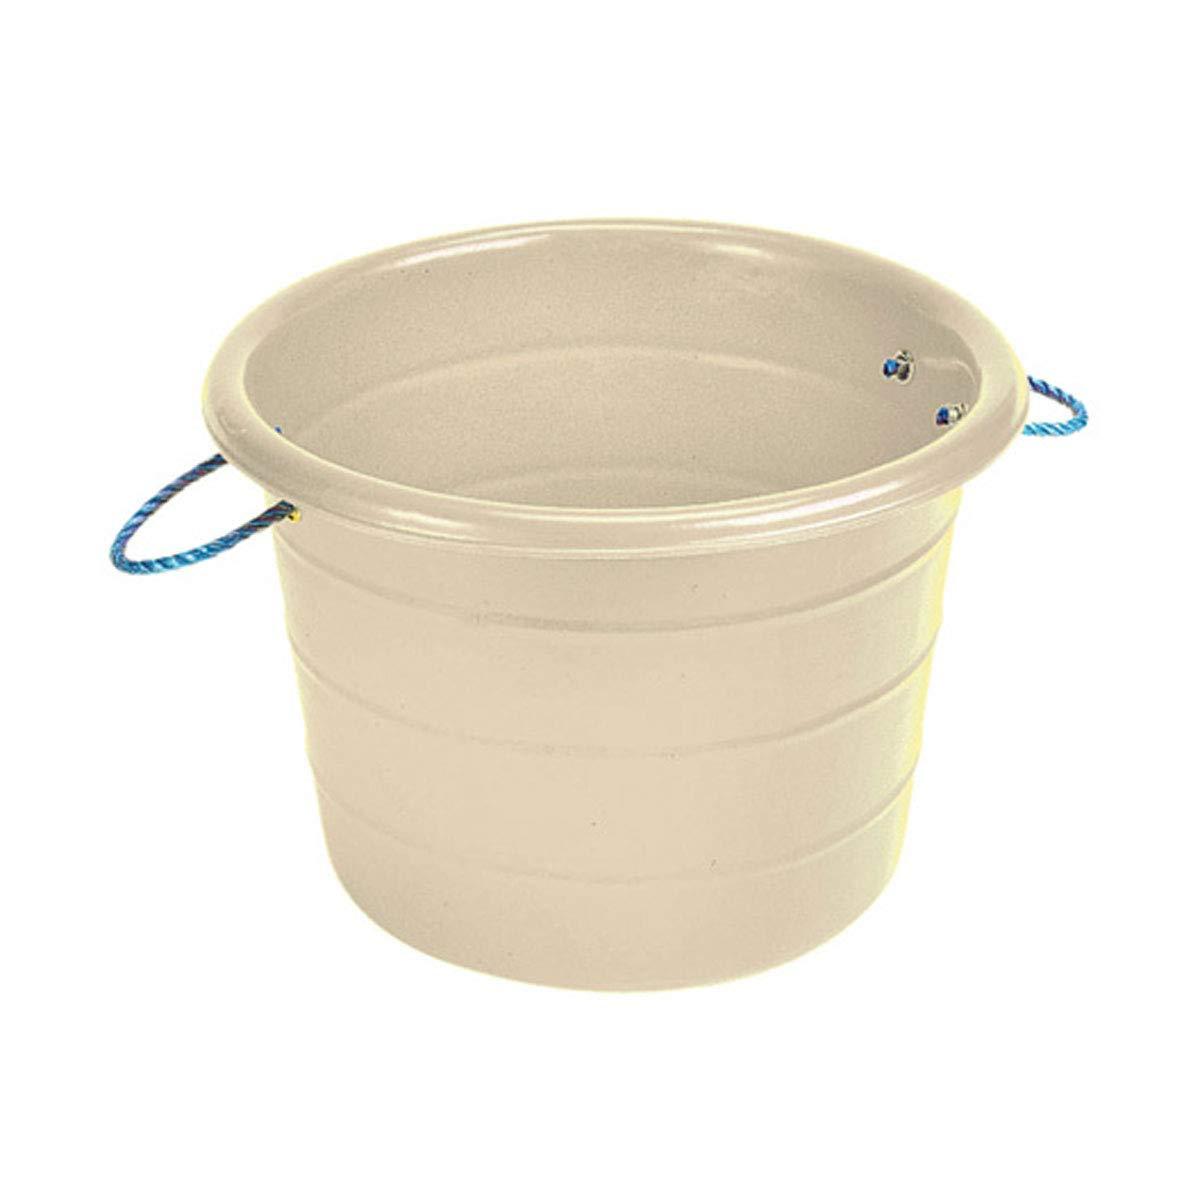 Stubbs Large Manure Bucket (One Size) (White)